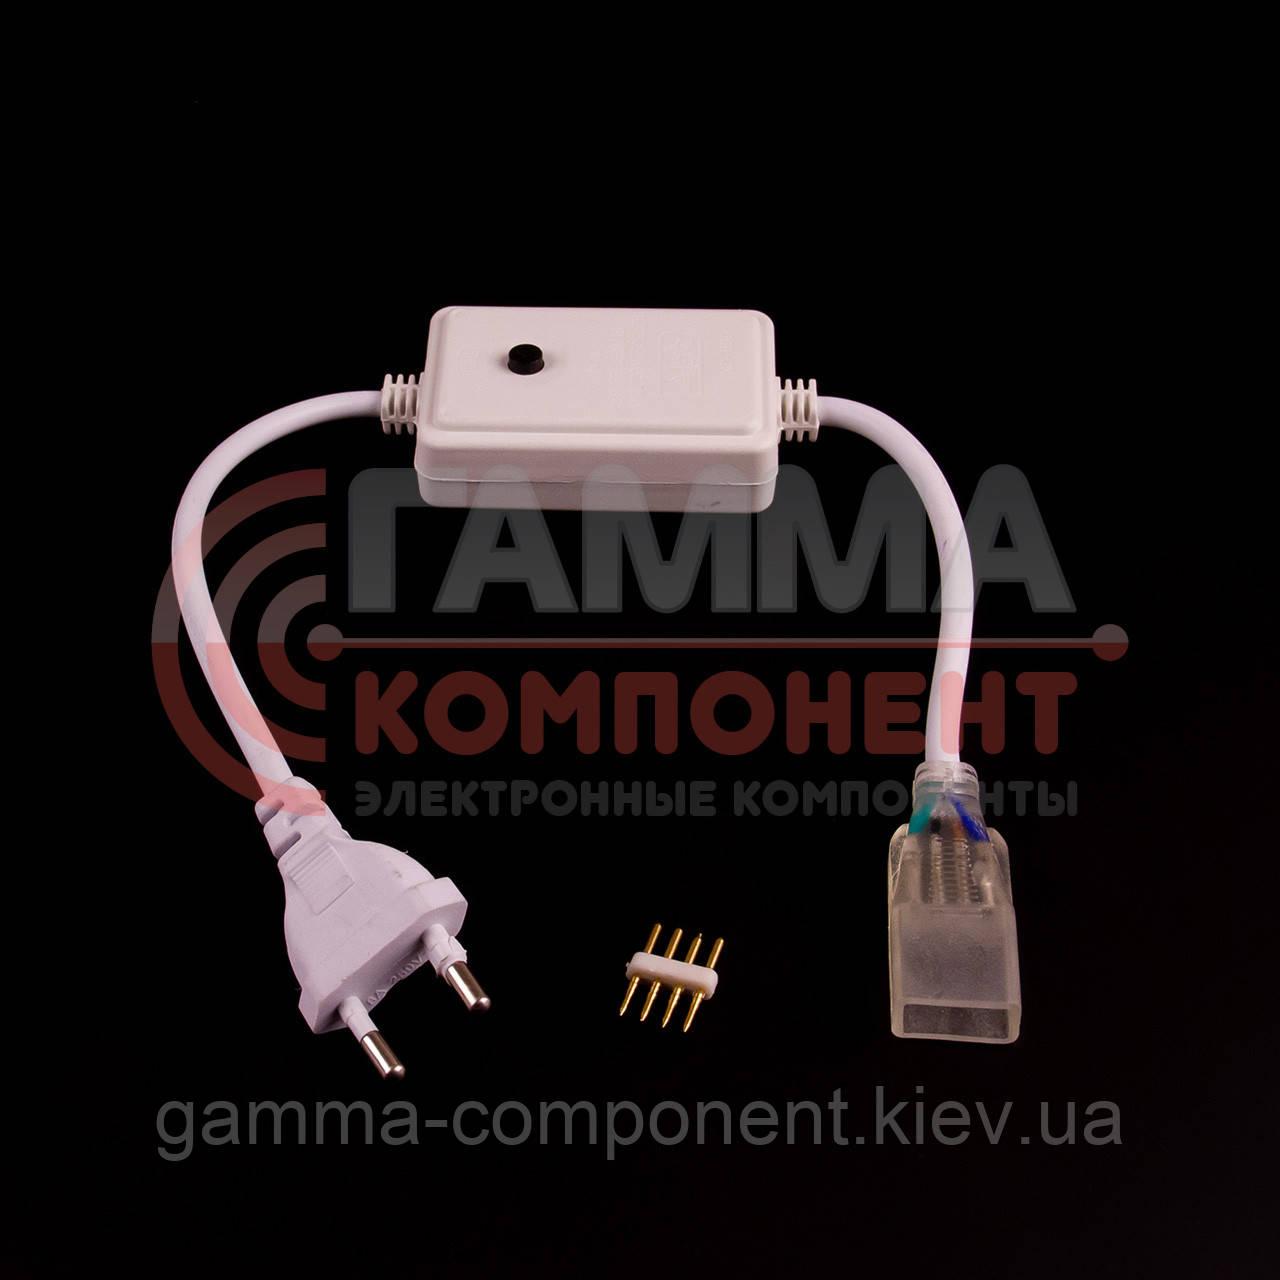 Адаптер питания для светодиодной ленты RGB smd 5050-60 лед/м + контроллер + коннектор 4pin